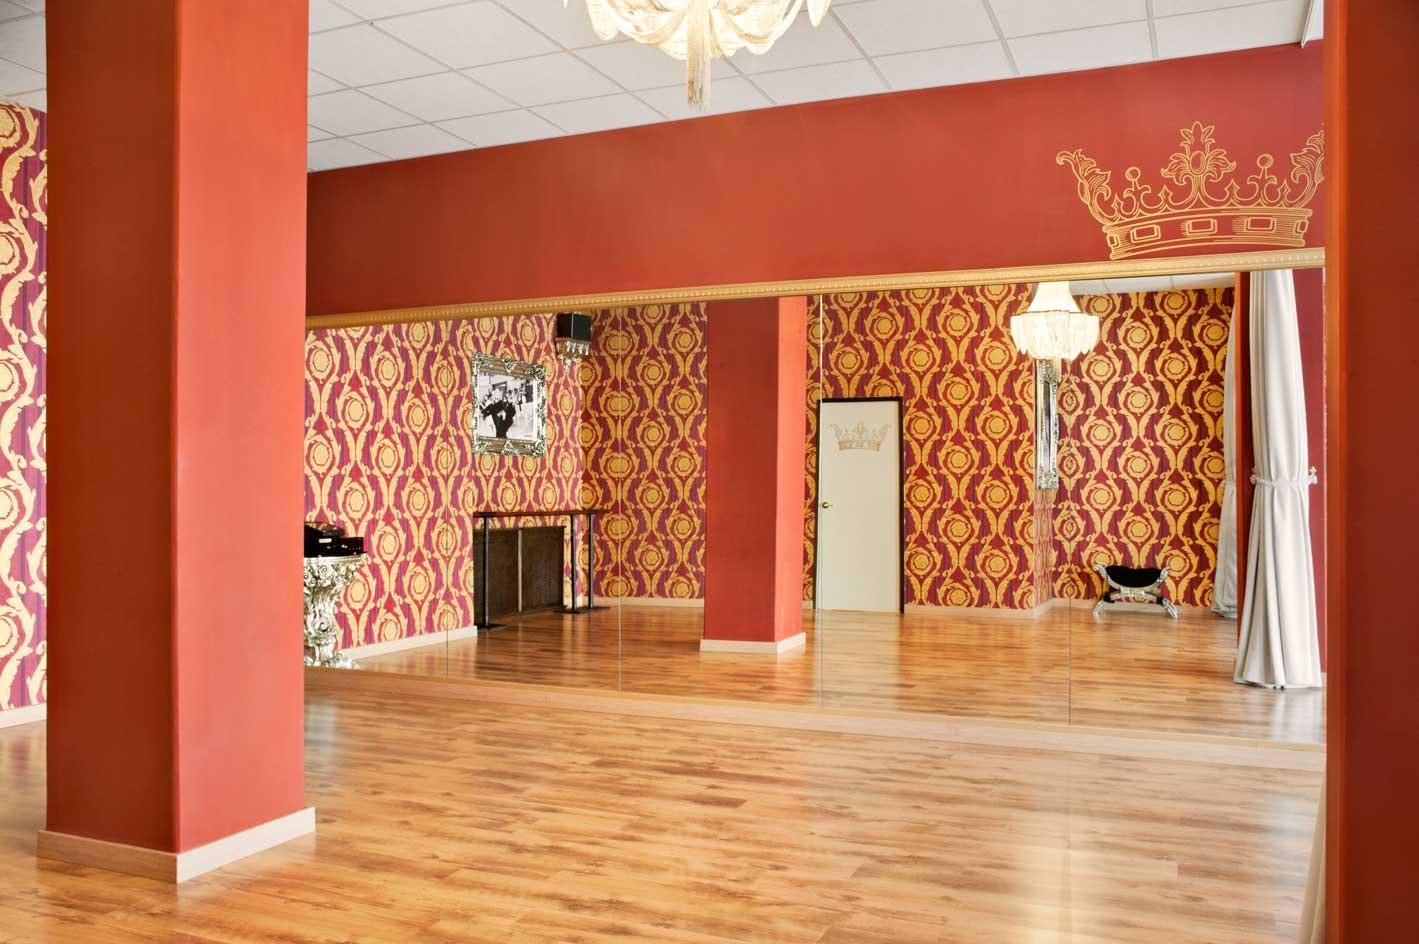 Foto 1 Oferta Portalo´s Escuela de baile y pilates Madrid {2} - GymForLess